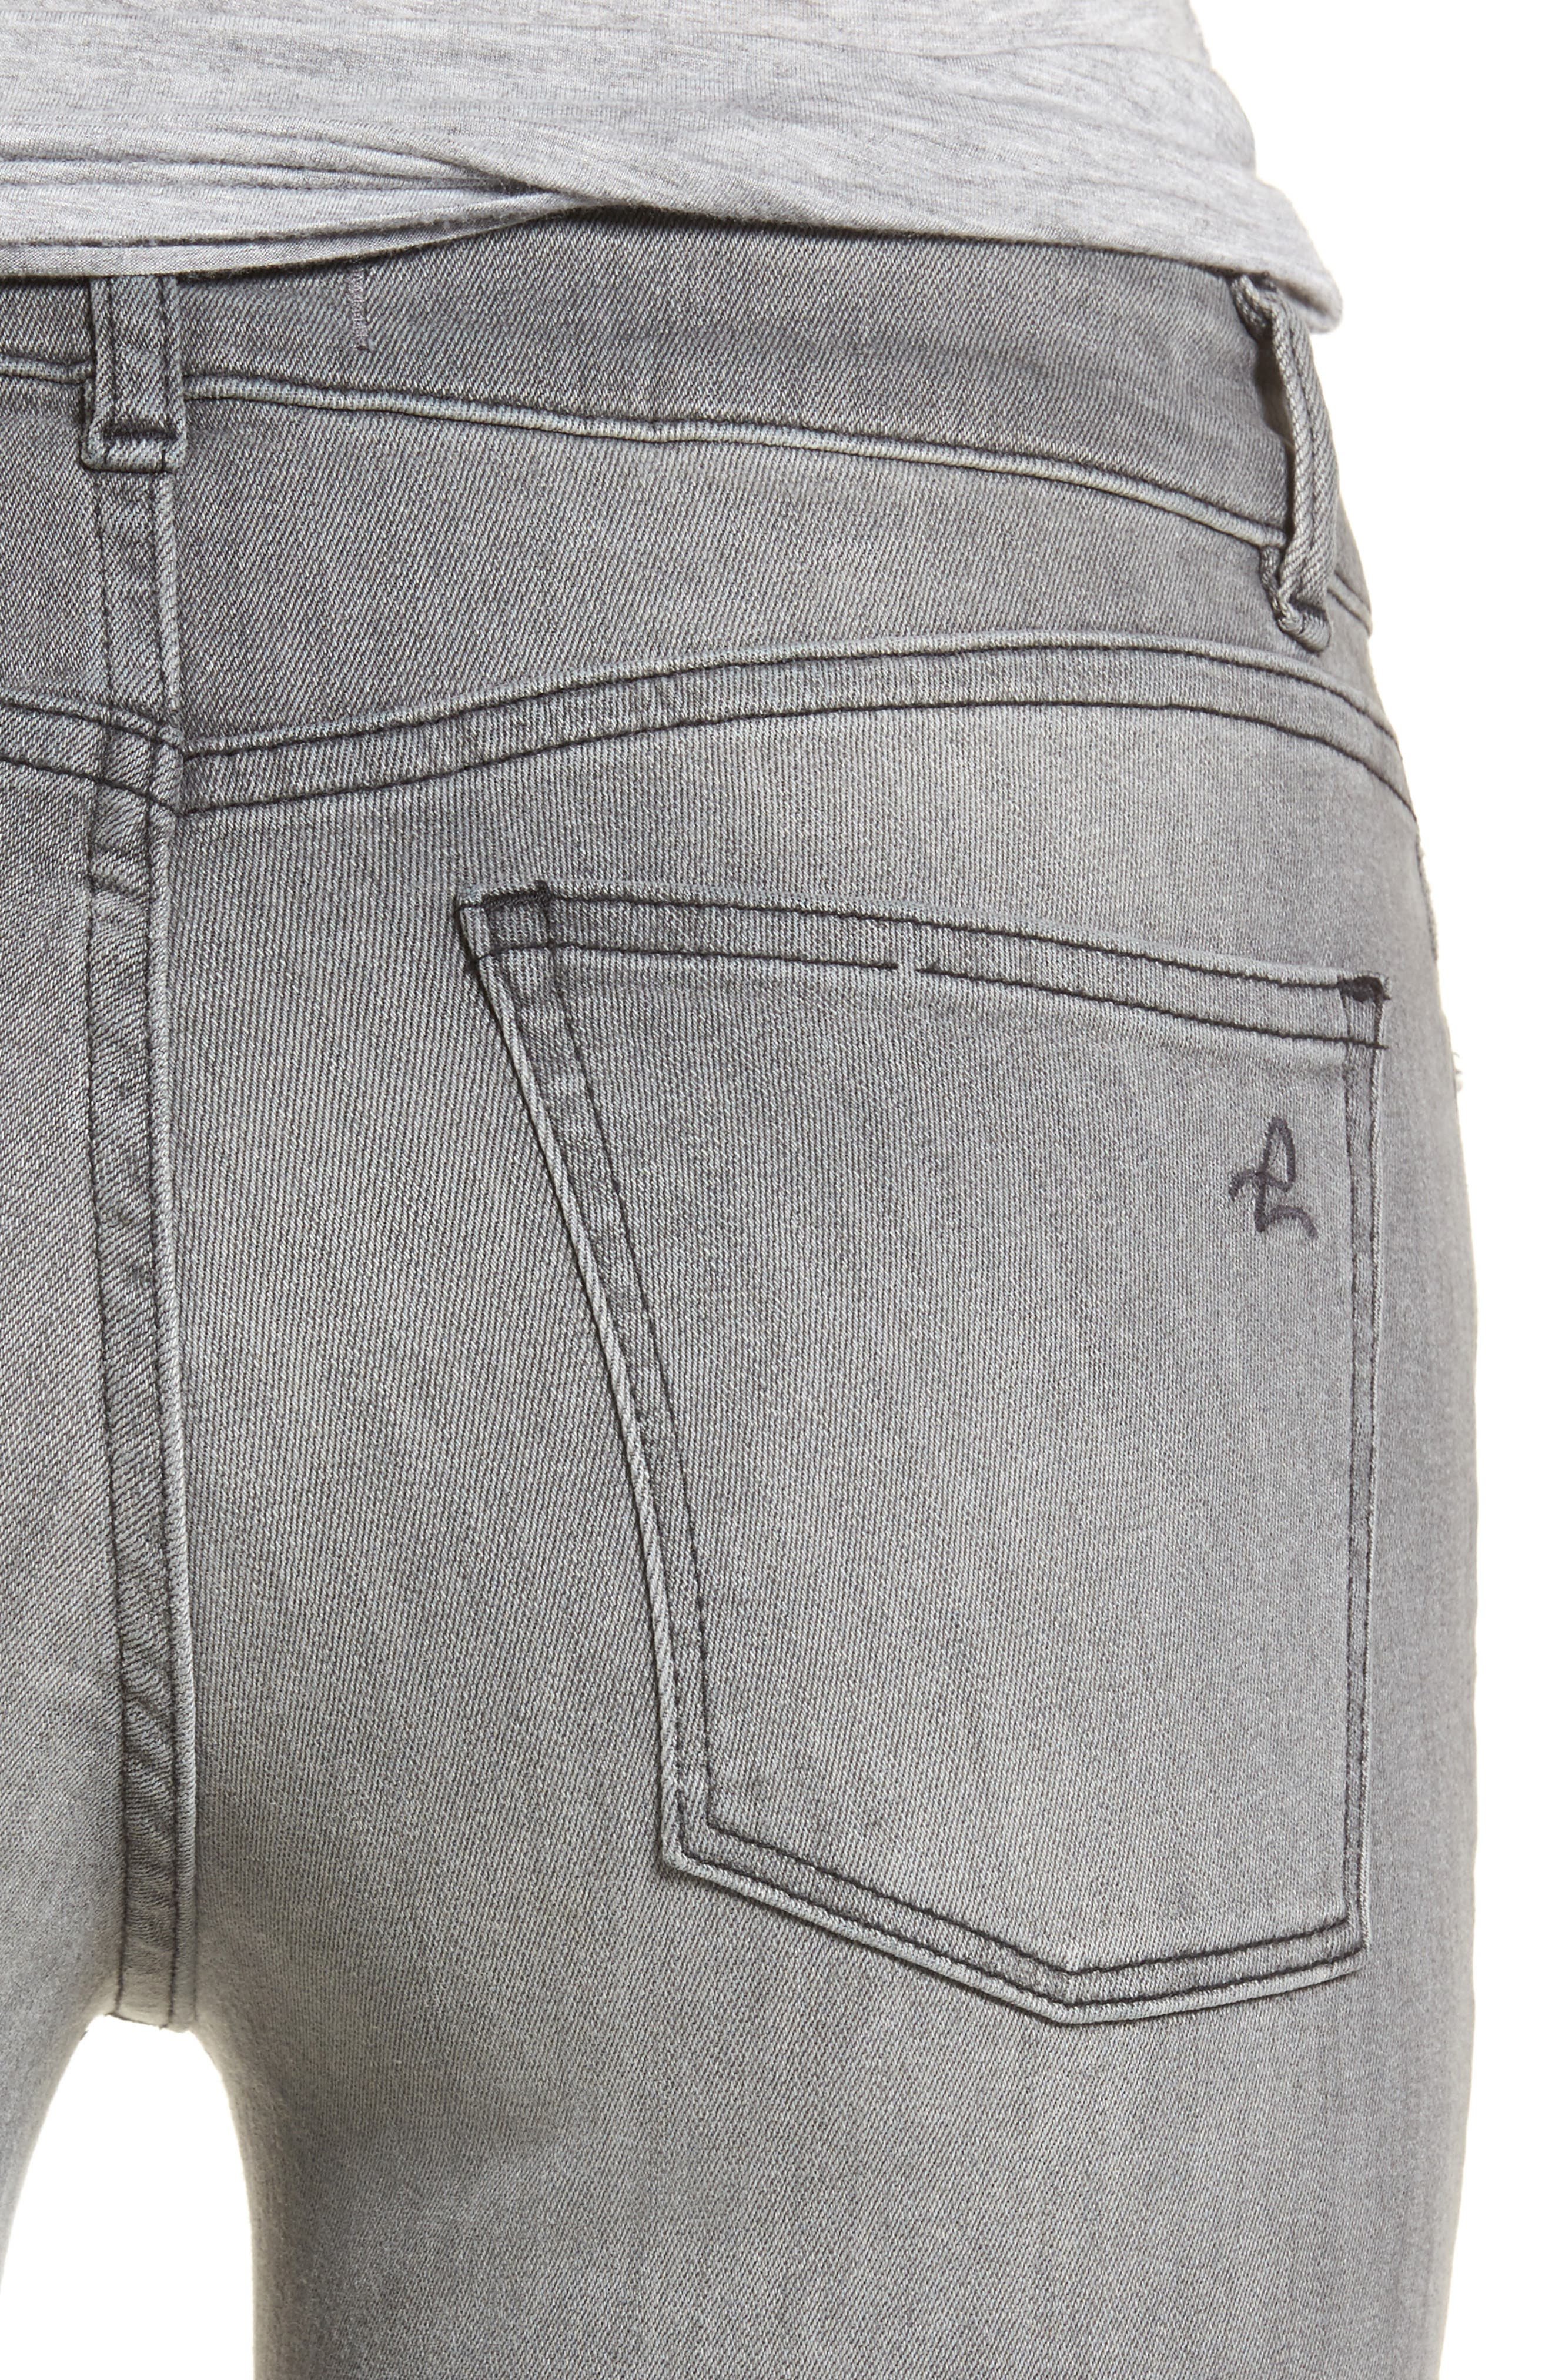 Emma Power Legging Jeans,                             Alternate thumbnail 4, color,